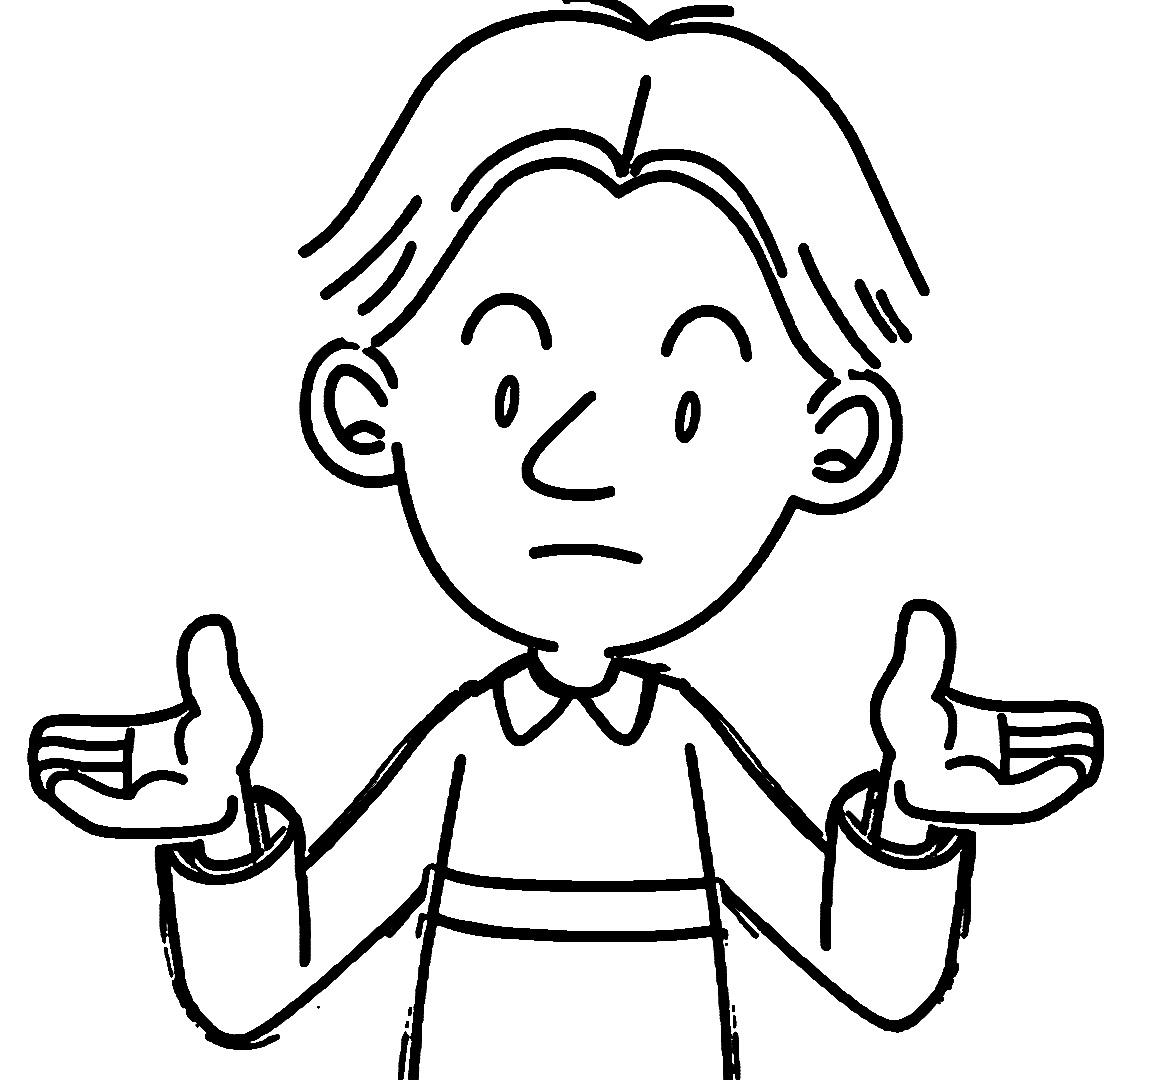 Speaking Cartoon Kids Coloring Page 13